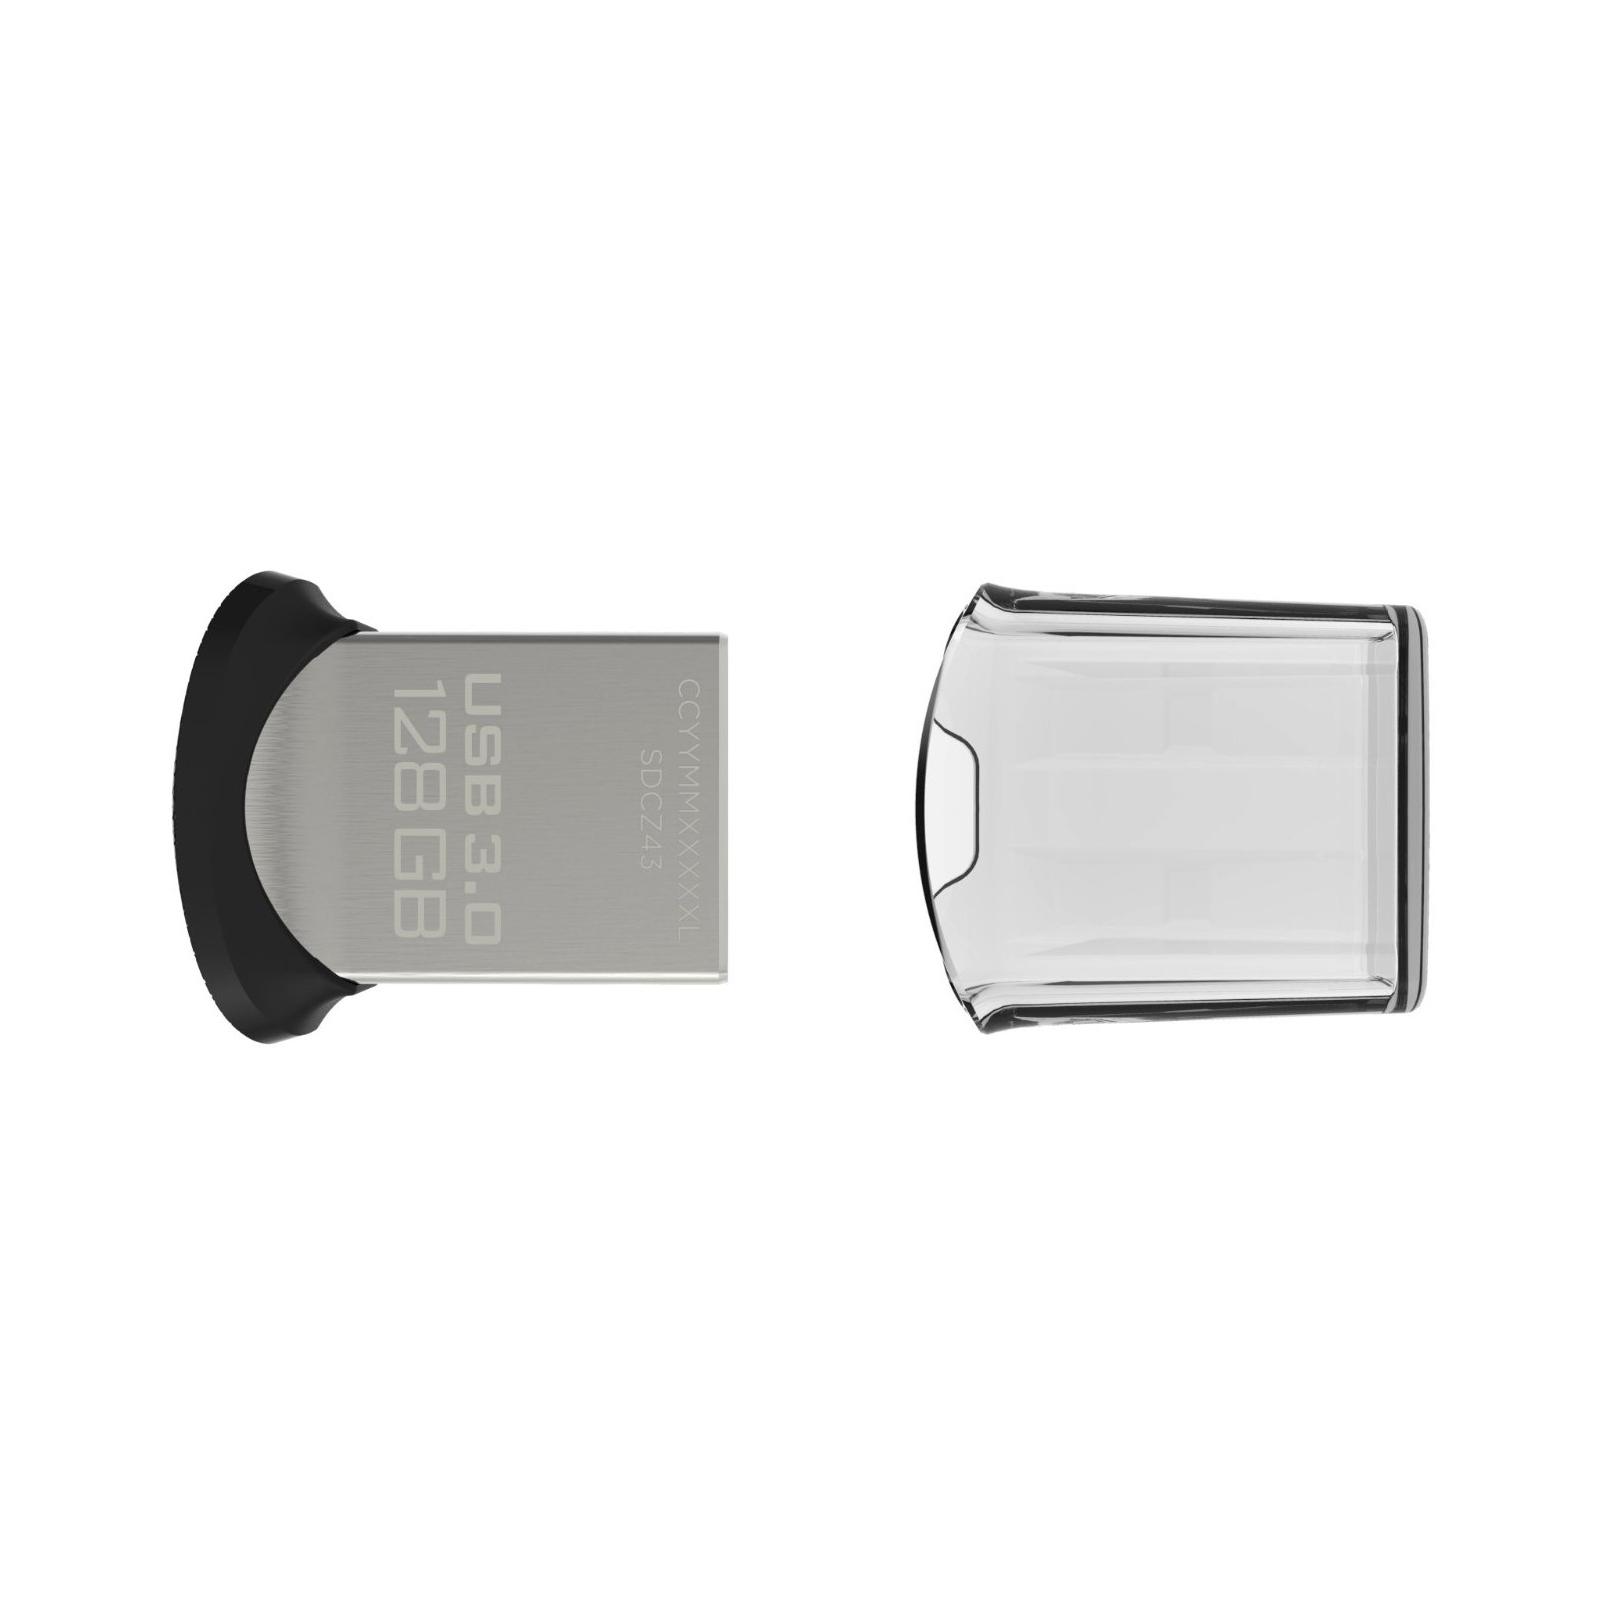 USB флеш накопитель SanDisk 16Gb Cruzer Fit (SDCZ33-016G-B35) изображение 3